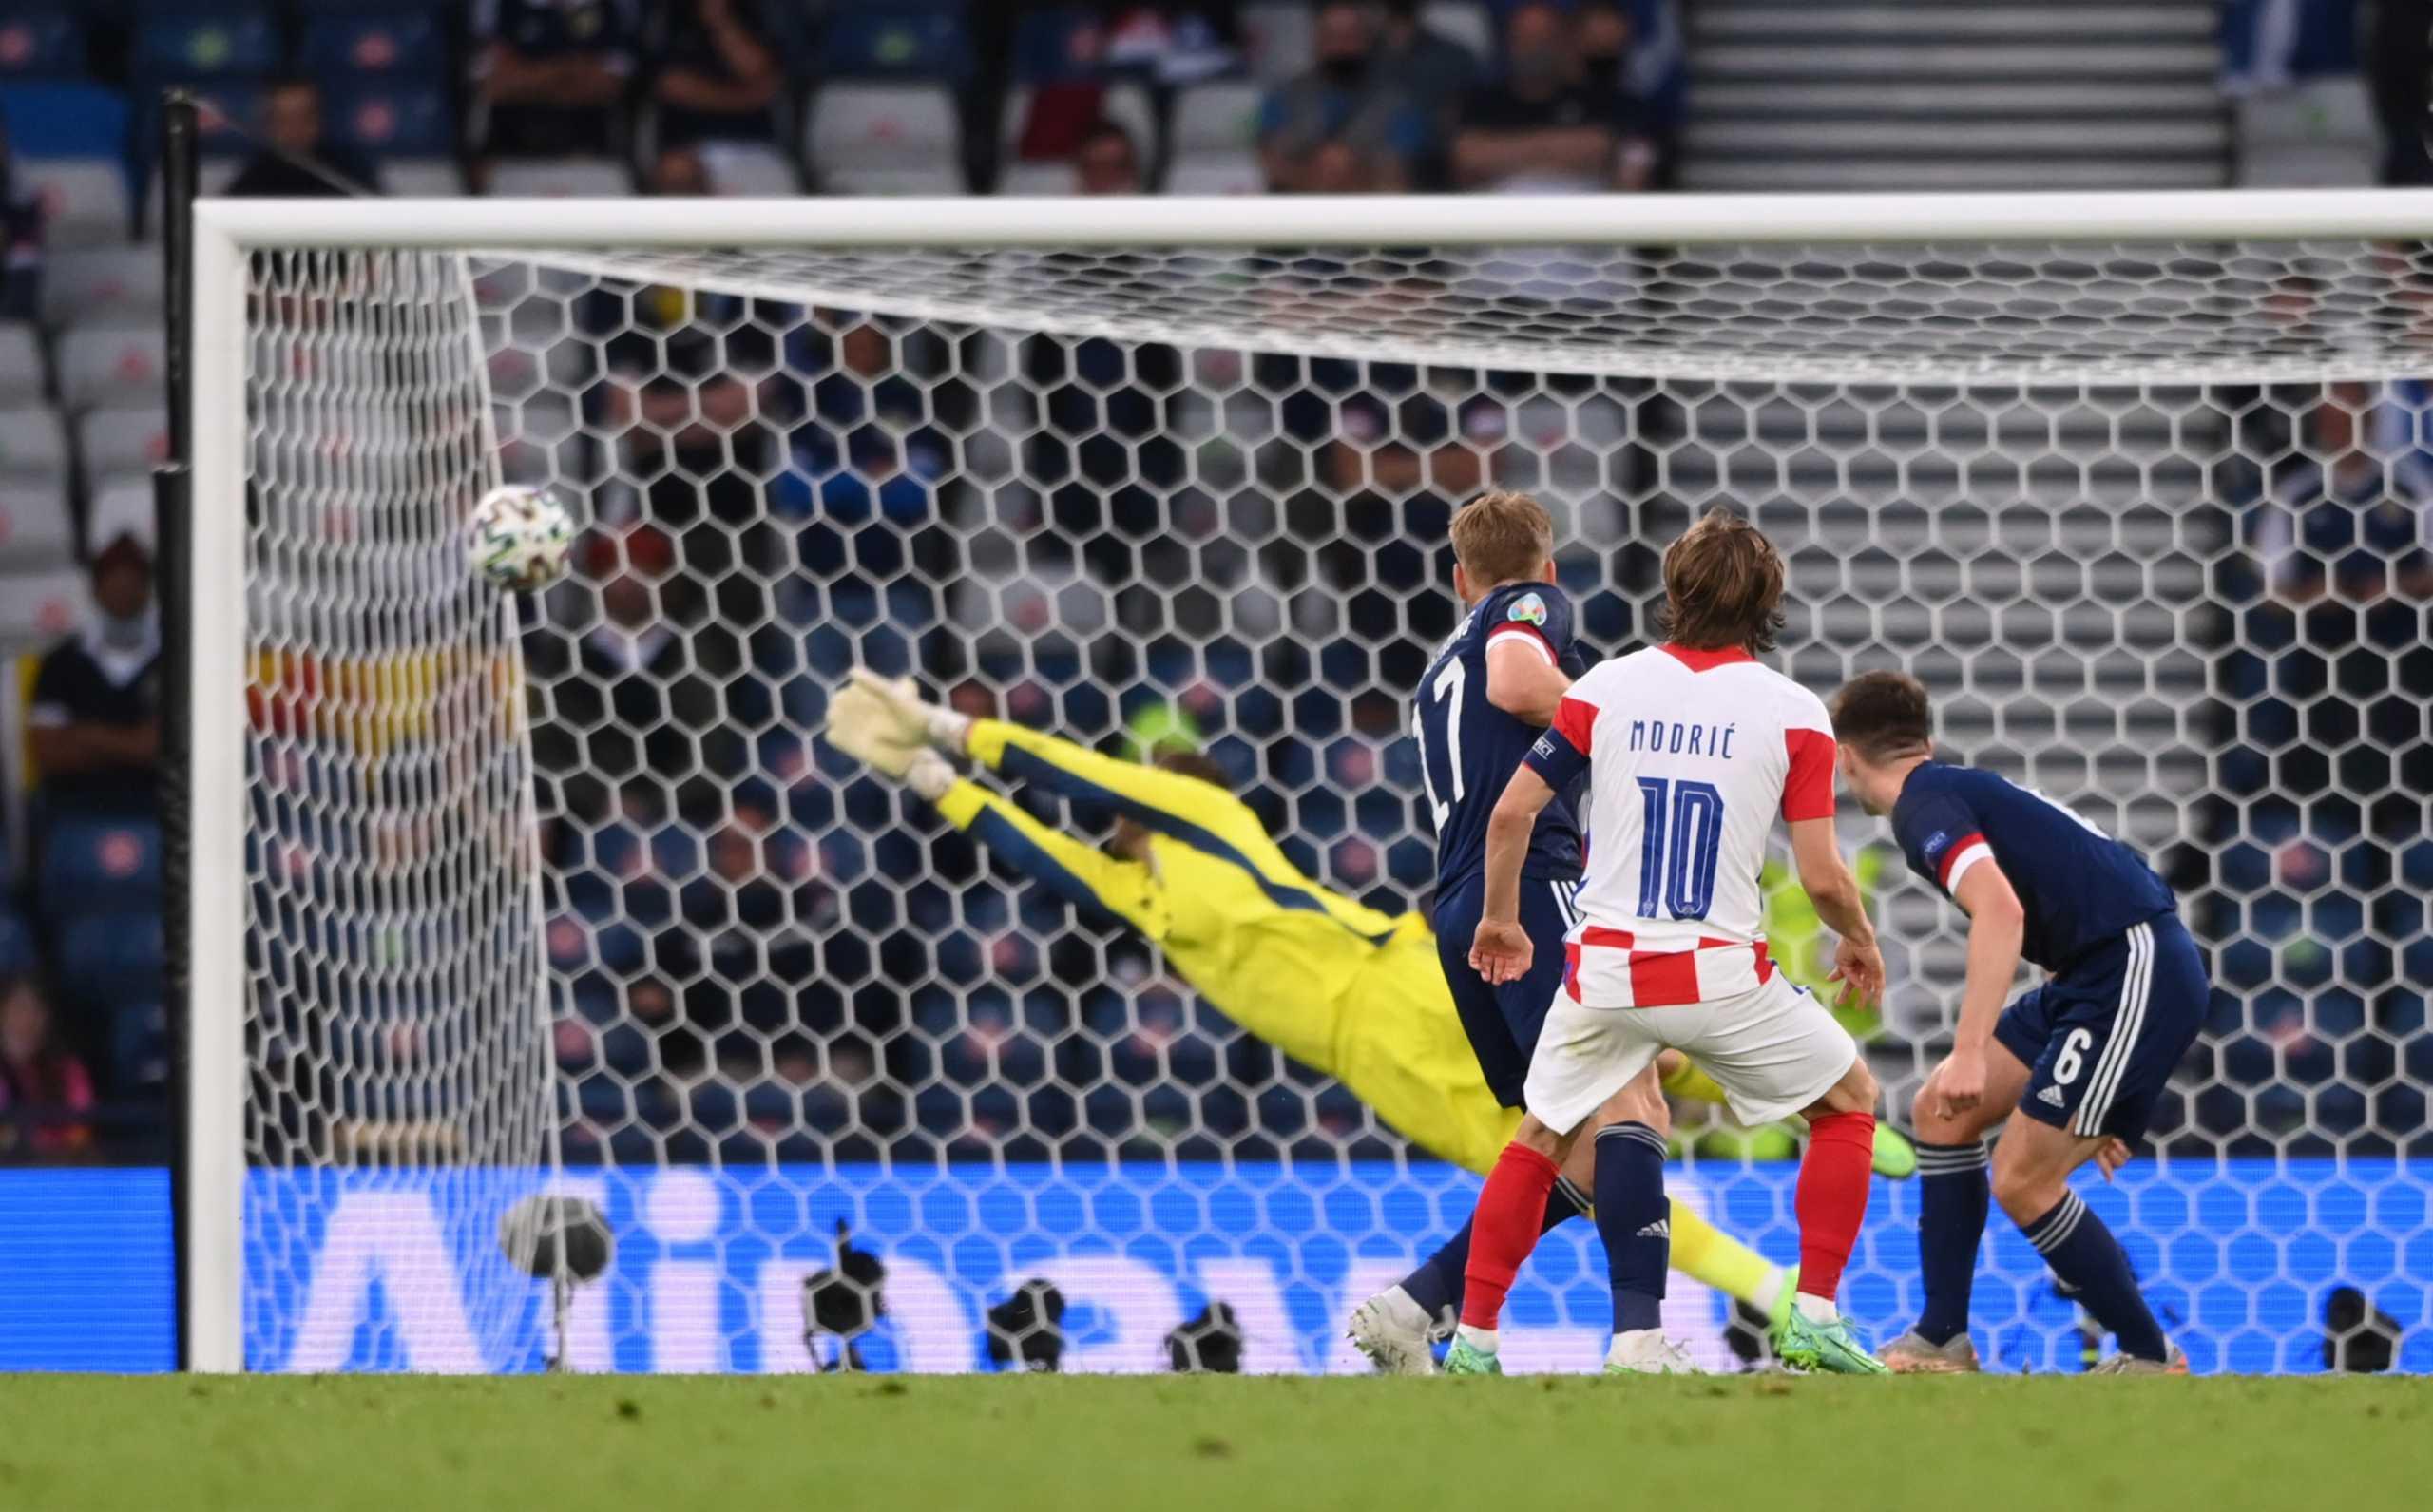 Euro 2020, Κροατία – Σκωτία: «Μυθικό τεμάχιο» από Μόντριτς